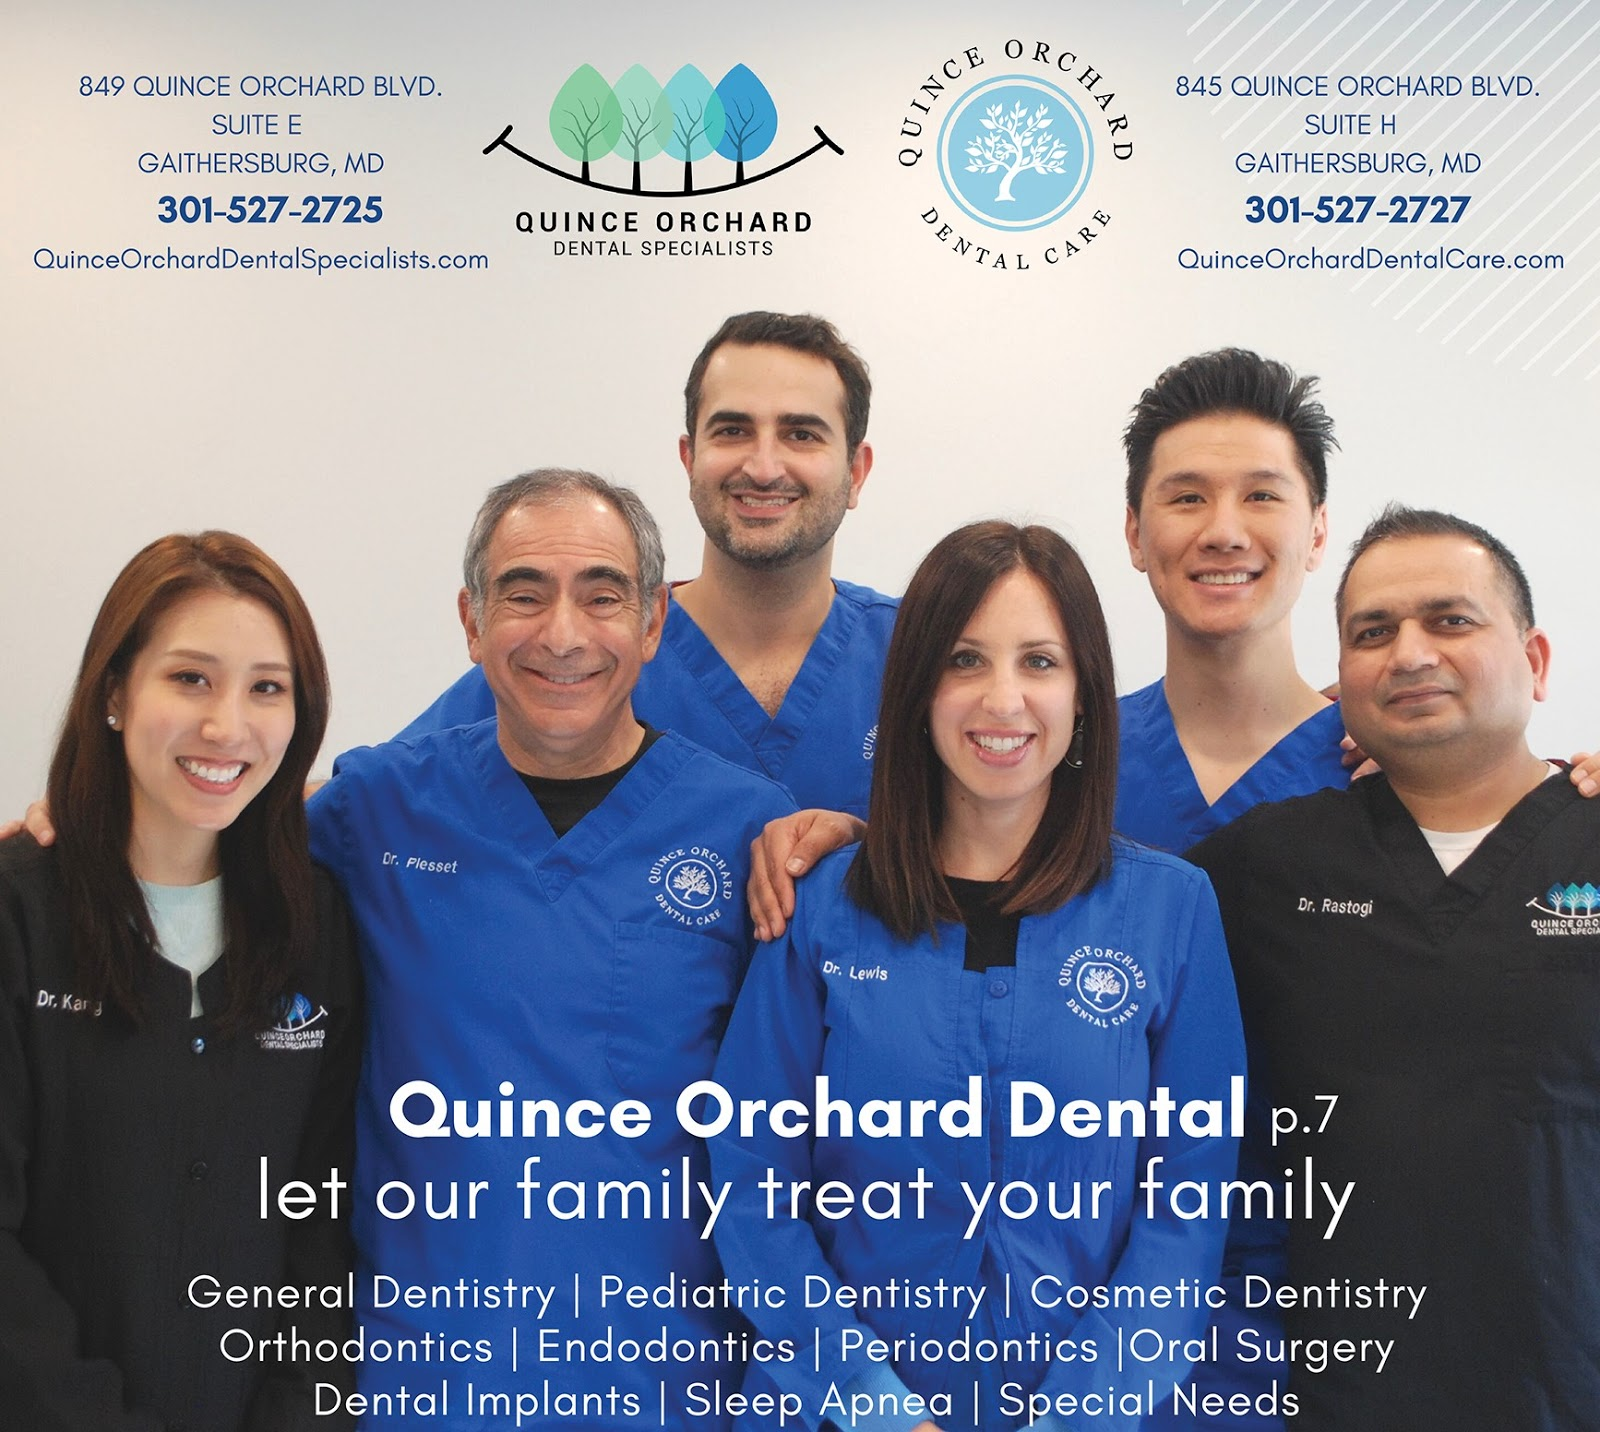 Team of QODC d